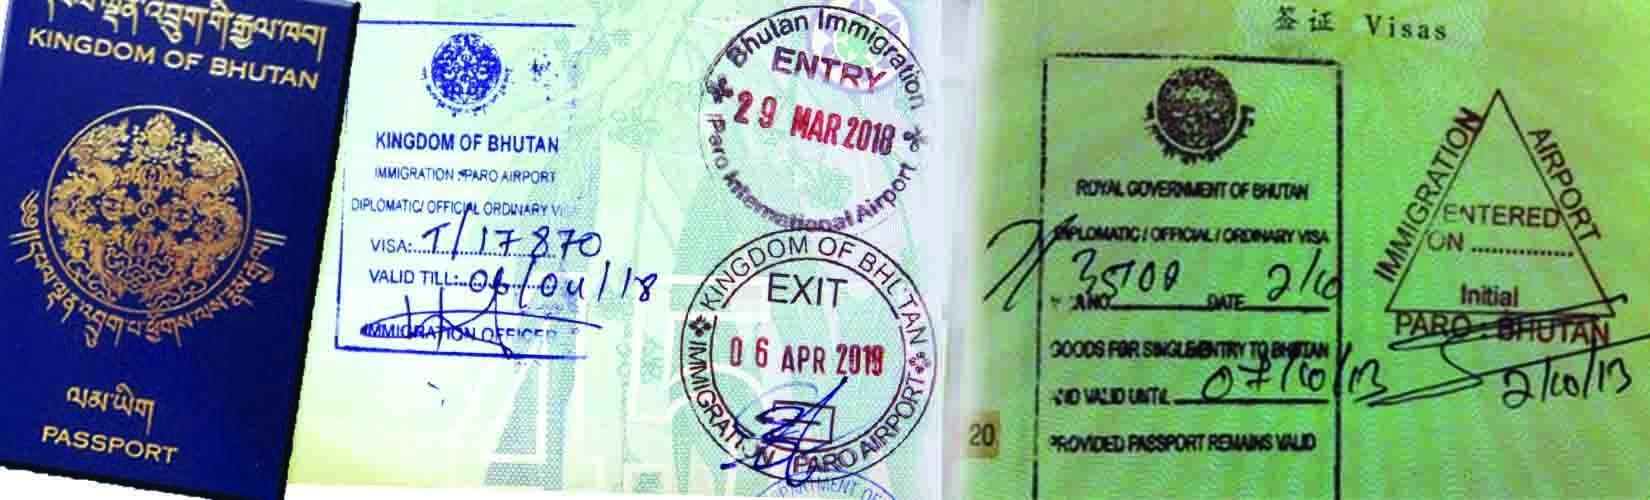 Bhutan Travel Info: Complete Bhutan Tourist Visa Information